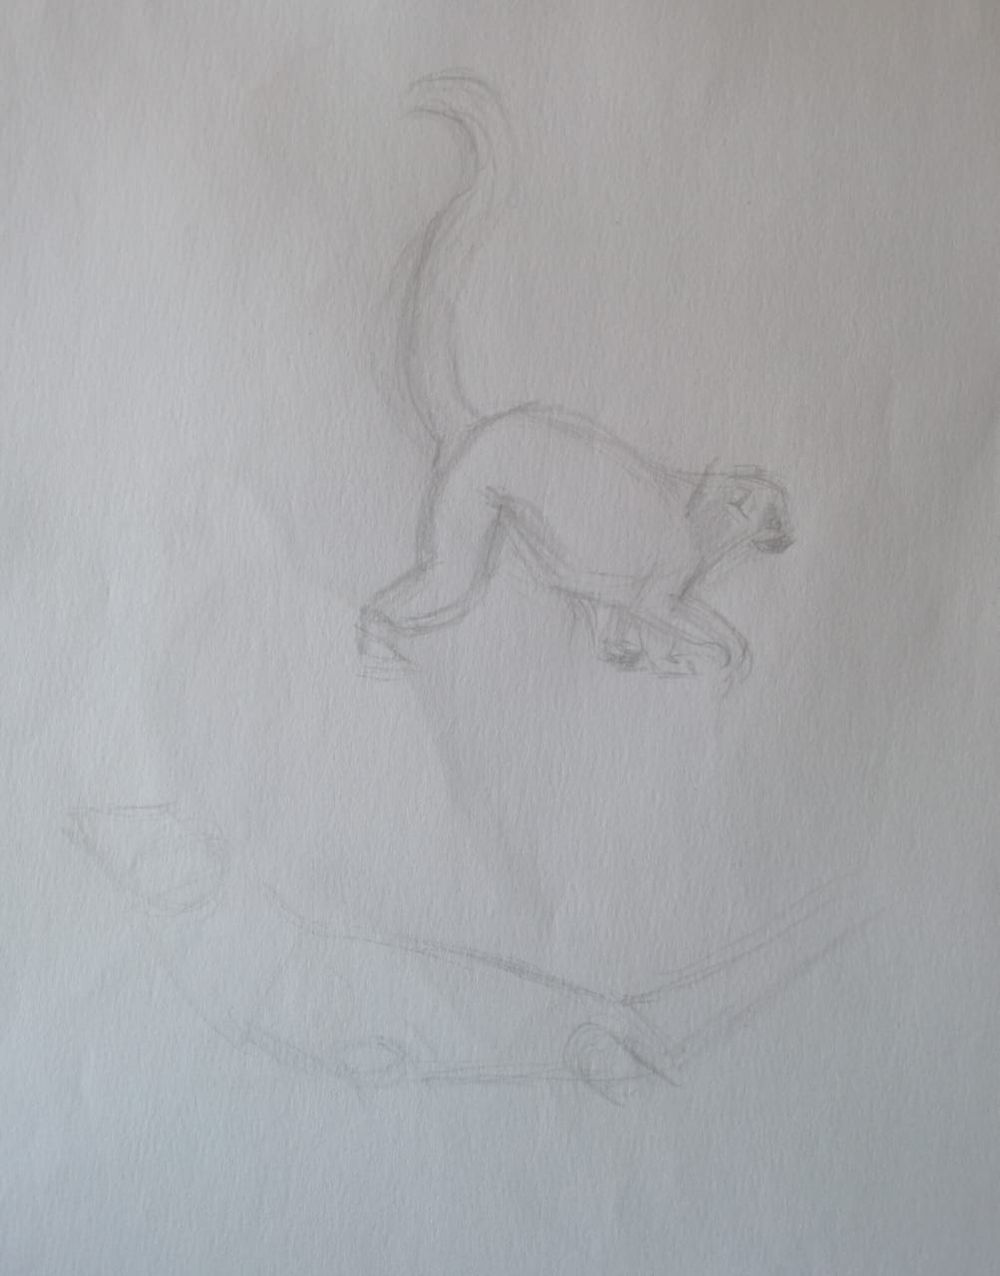 Basic Drawing Skills - image 19 - student project